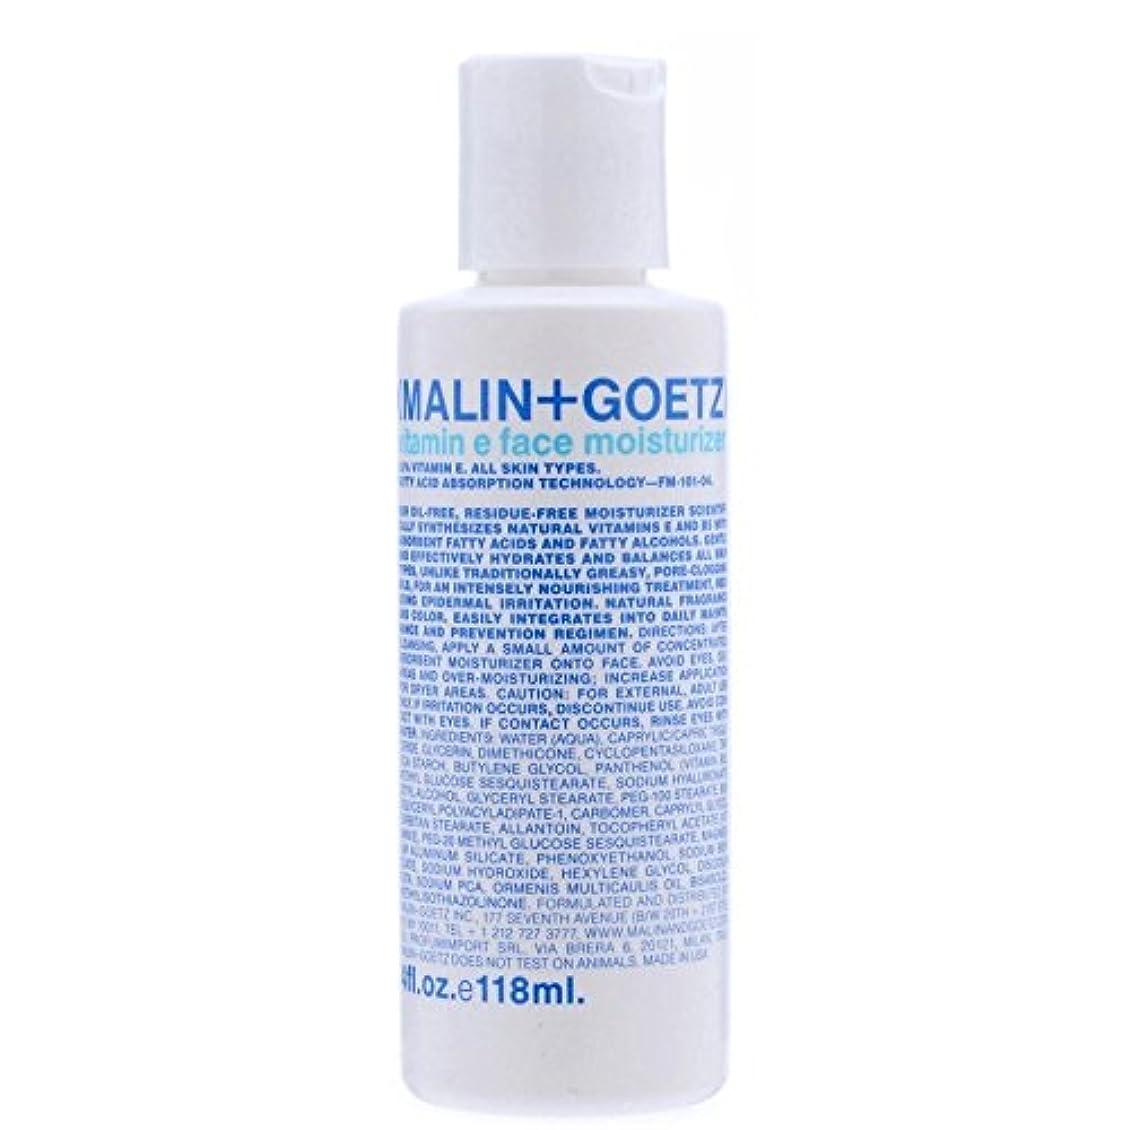 MALIN+GOETZ Vitamin E Face Moisturiser - マリン+ゲッツビタミンの顔の保湿剤 [並行輸入品]